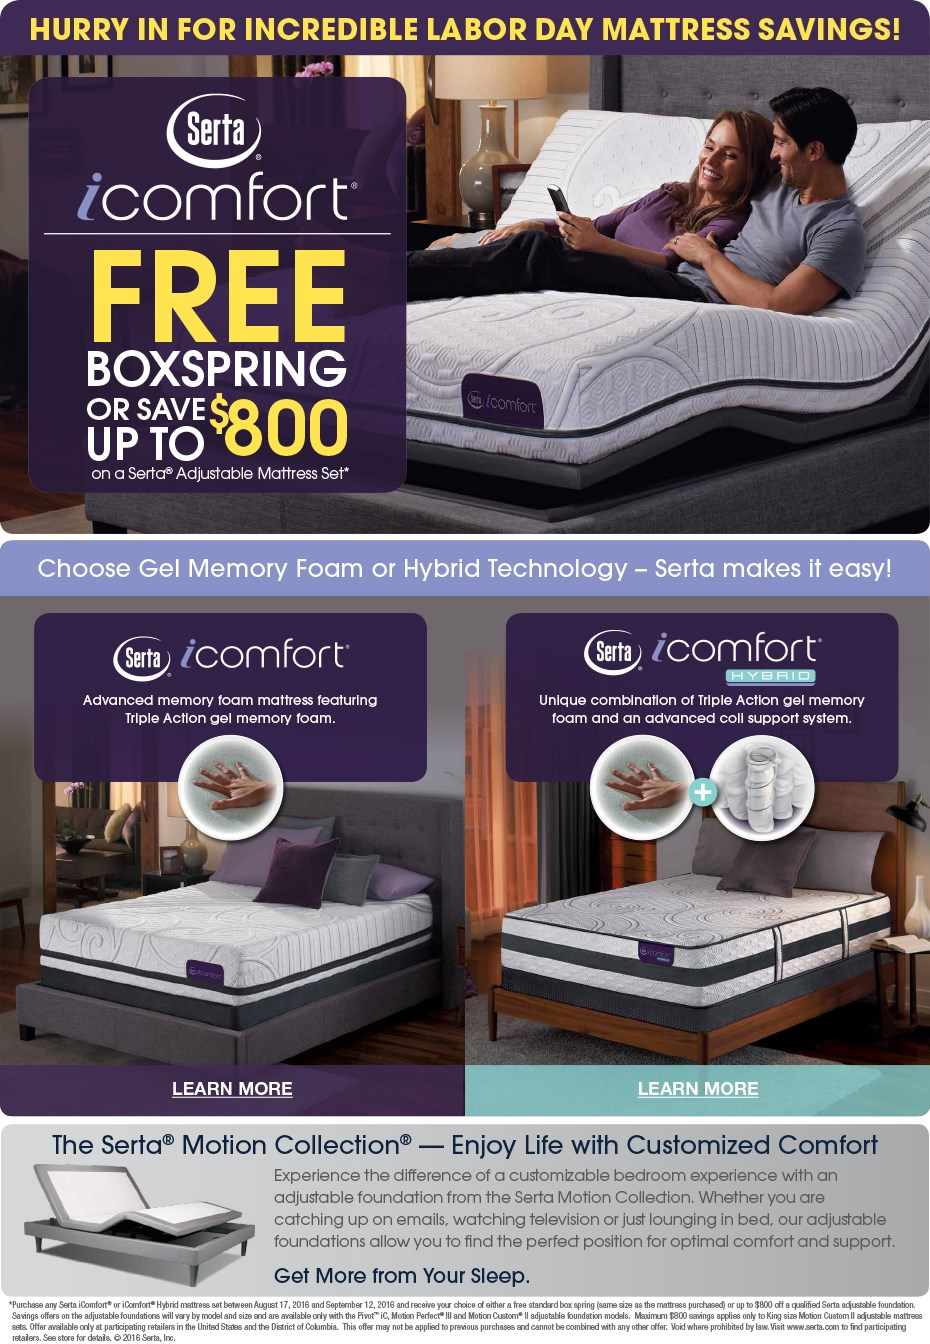 Serta iComfort Labor Day Sale!